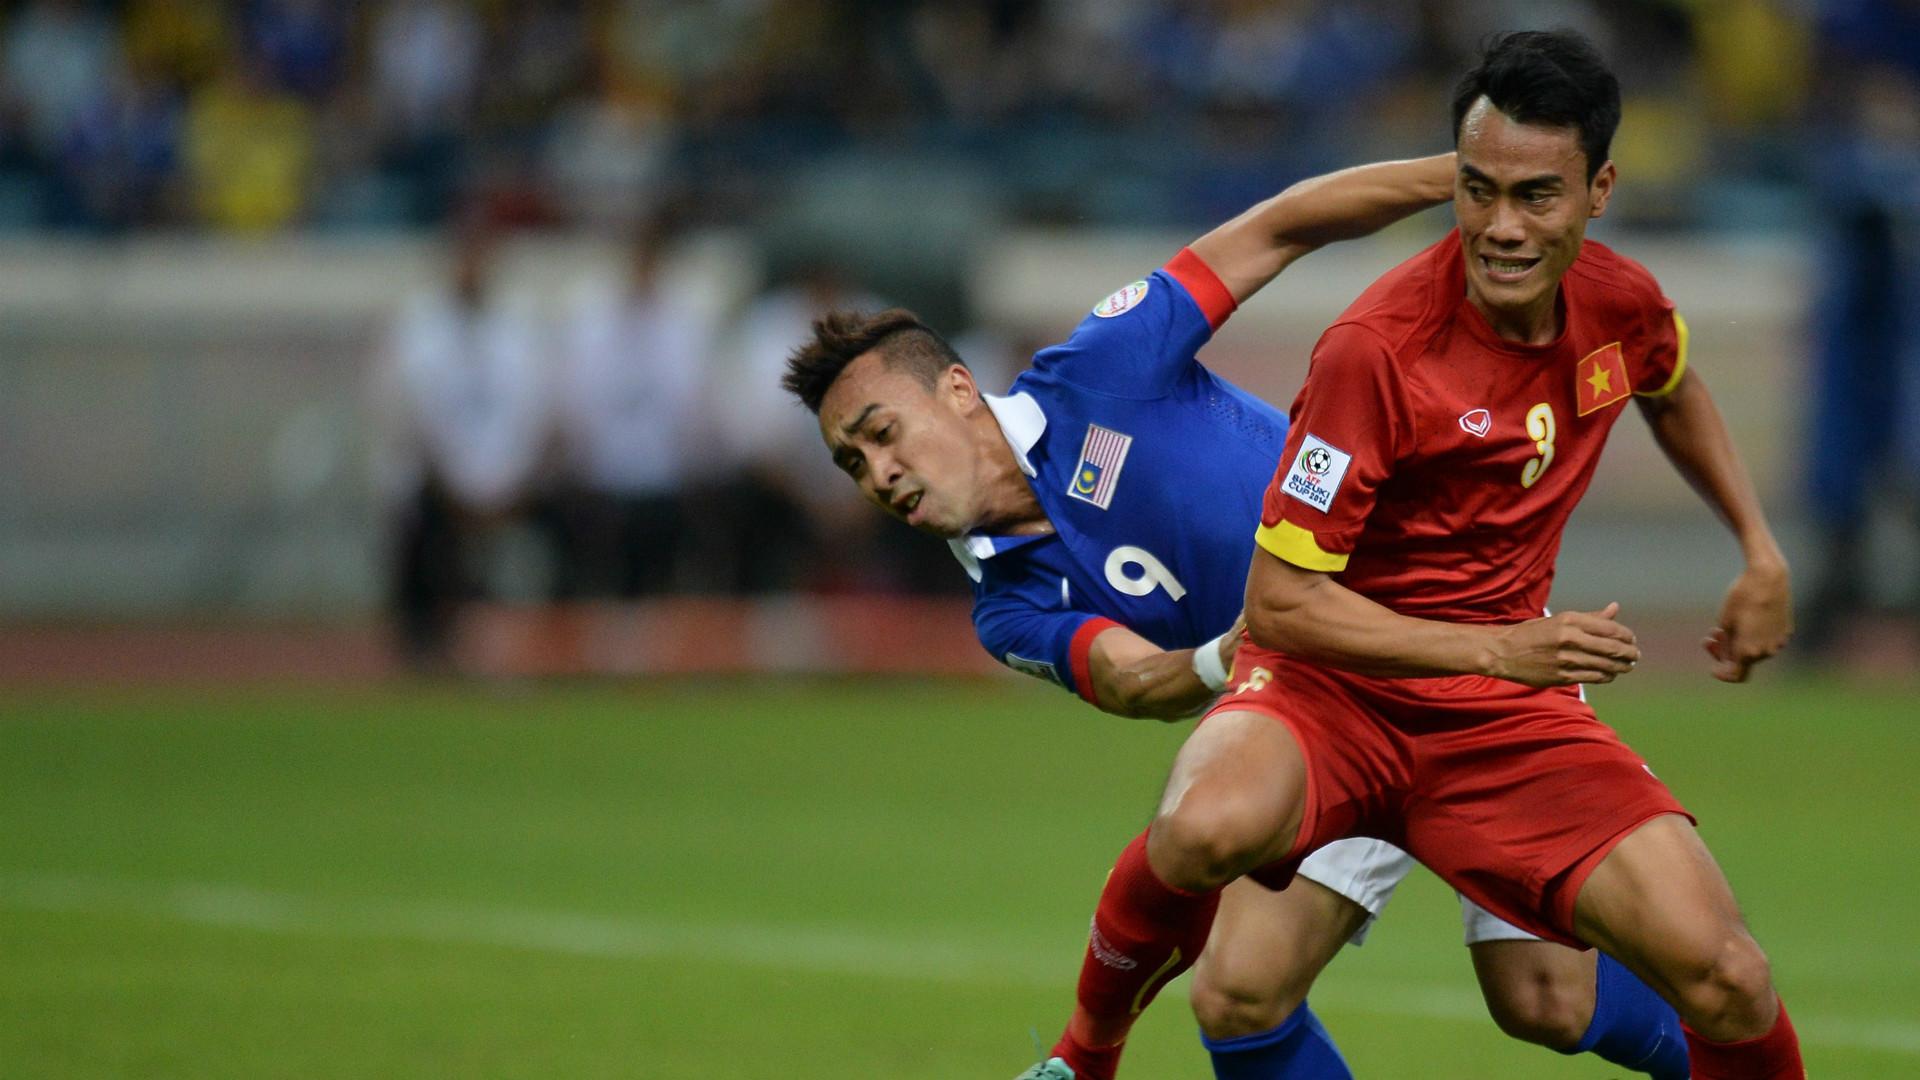 Le Phuoc Tu & Norshahrul Idlan - Malaysia vs Vietnam 07122014